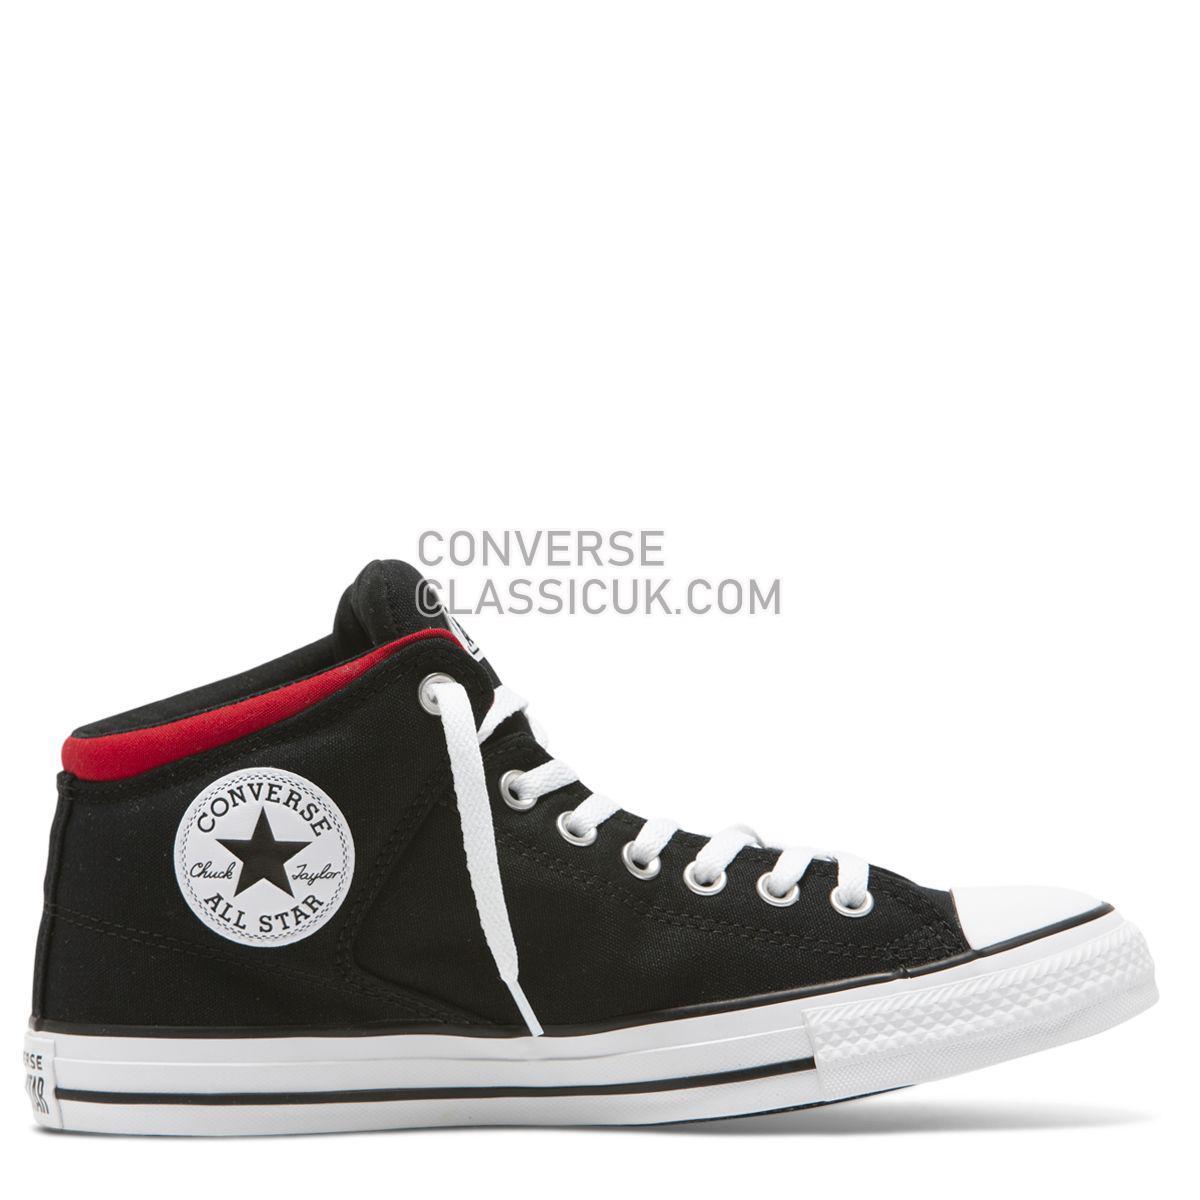 Converse Chuck Taylor All Star High Street Wordmark High Top Black Mens Womens Unisex 165433 Black/White/Enamel Red Shoes